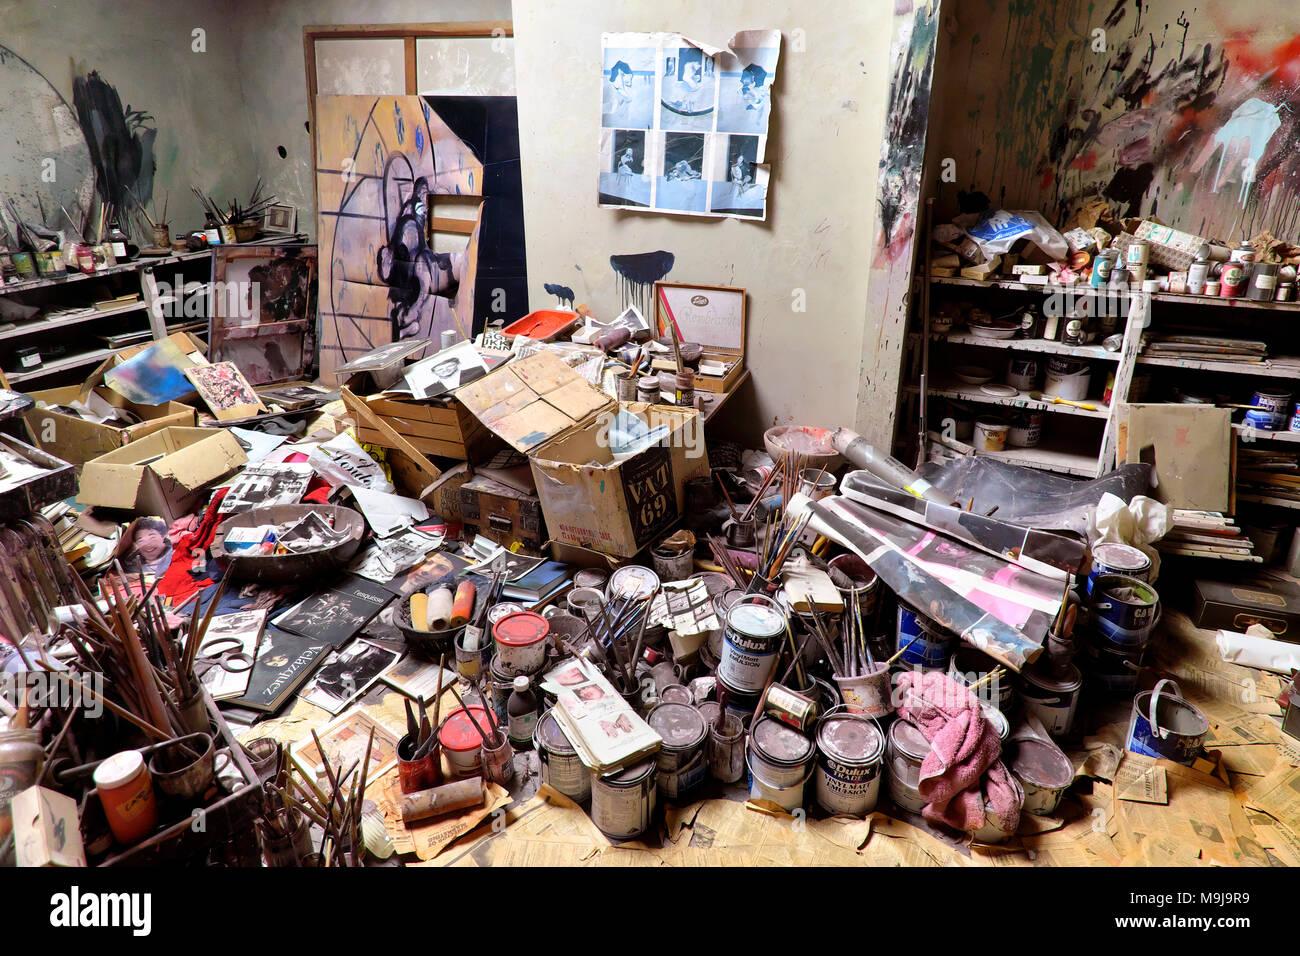 Francis Bacon Studio - reconstructed studio of painter Francis Bacon, Dublin City Gallery The Hugh Lane, Dublin, Ireland - Stock Image